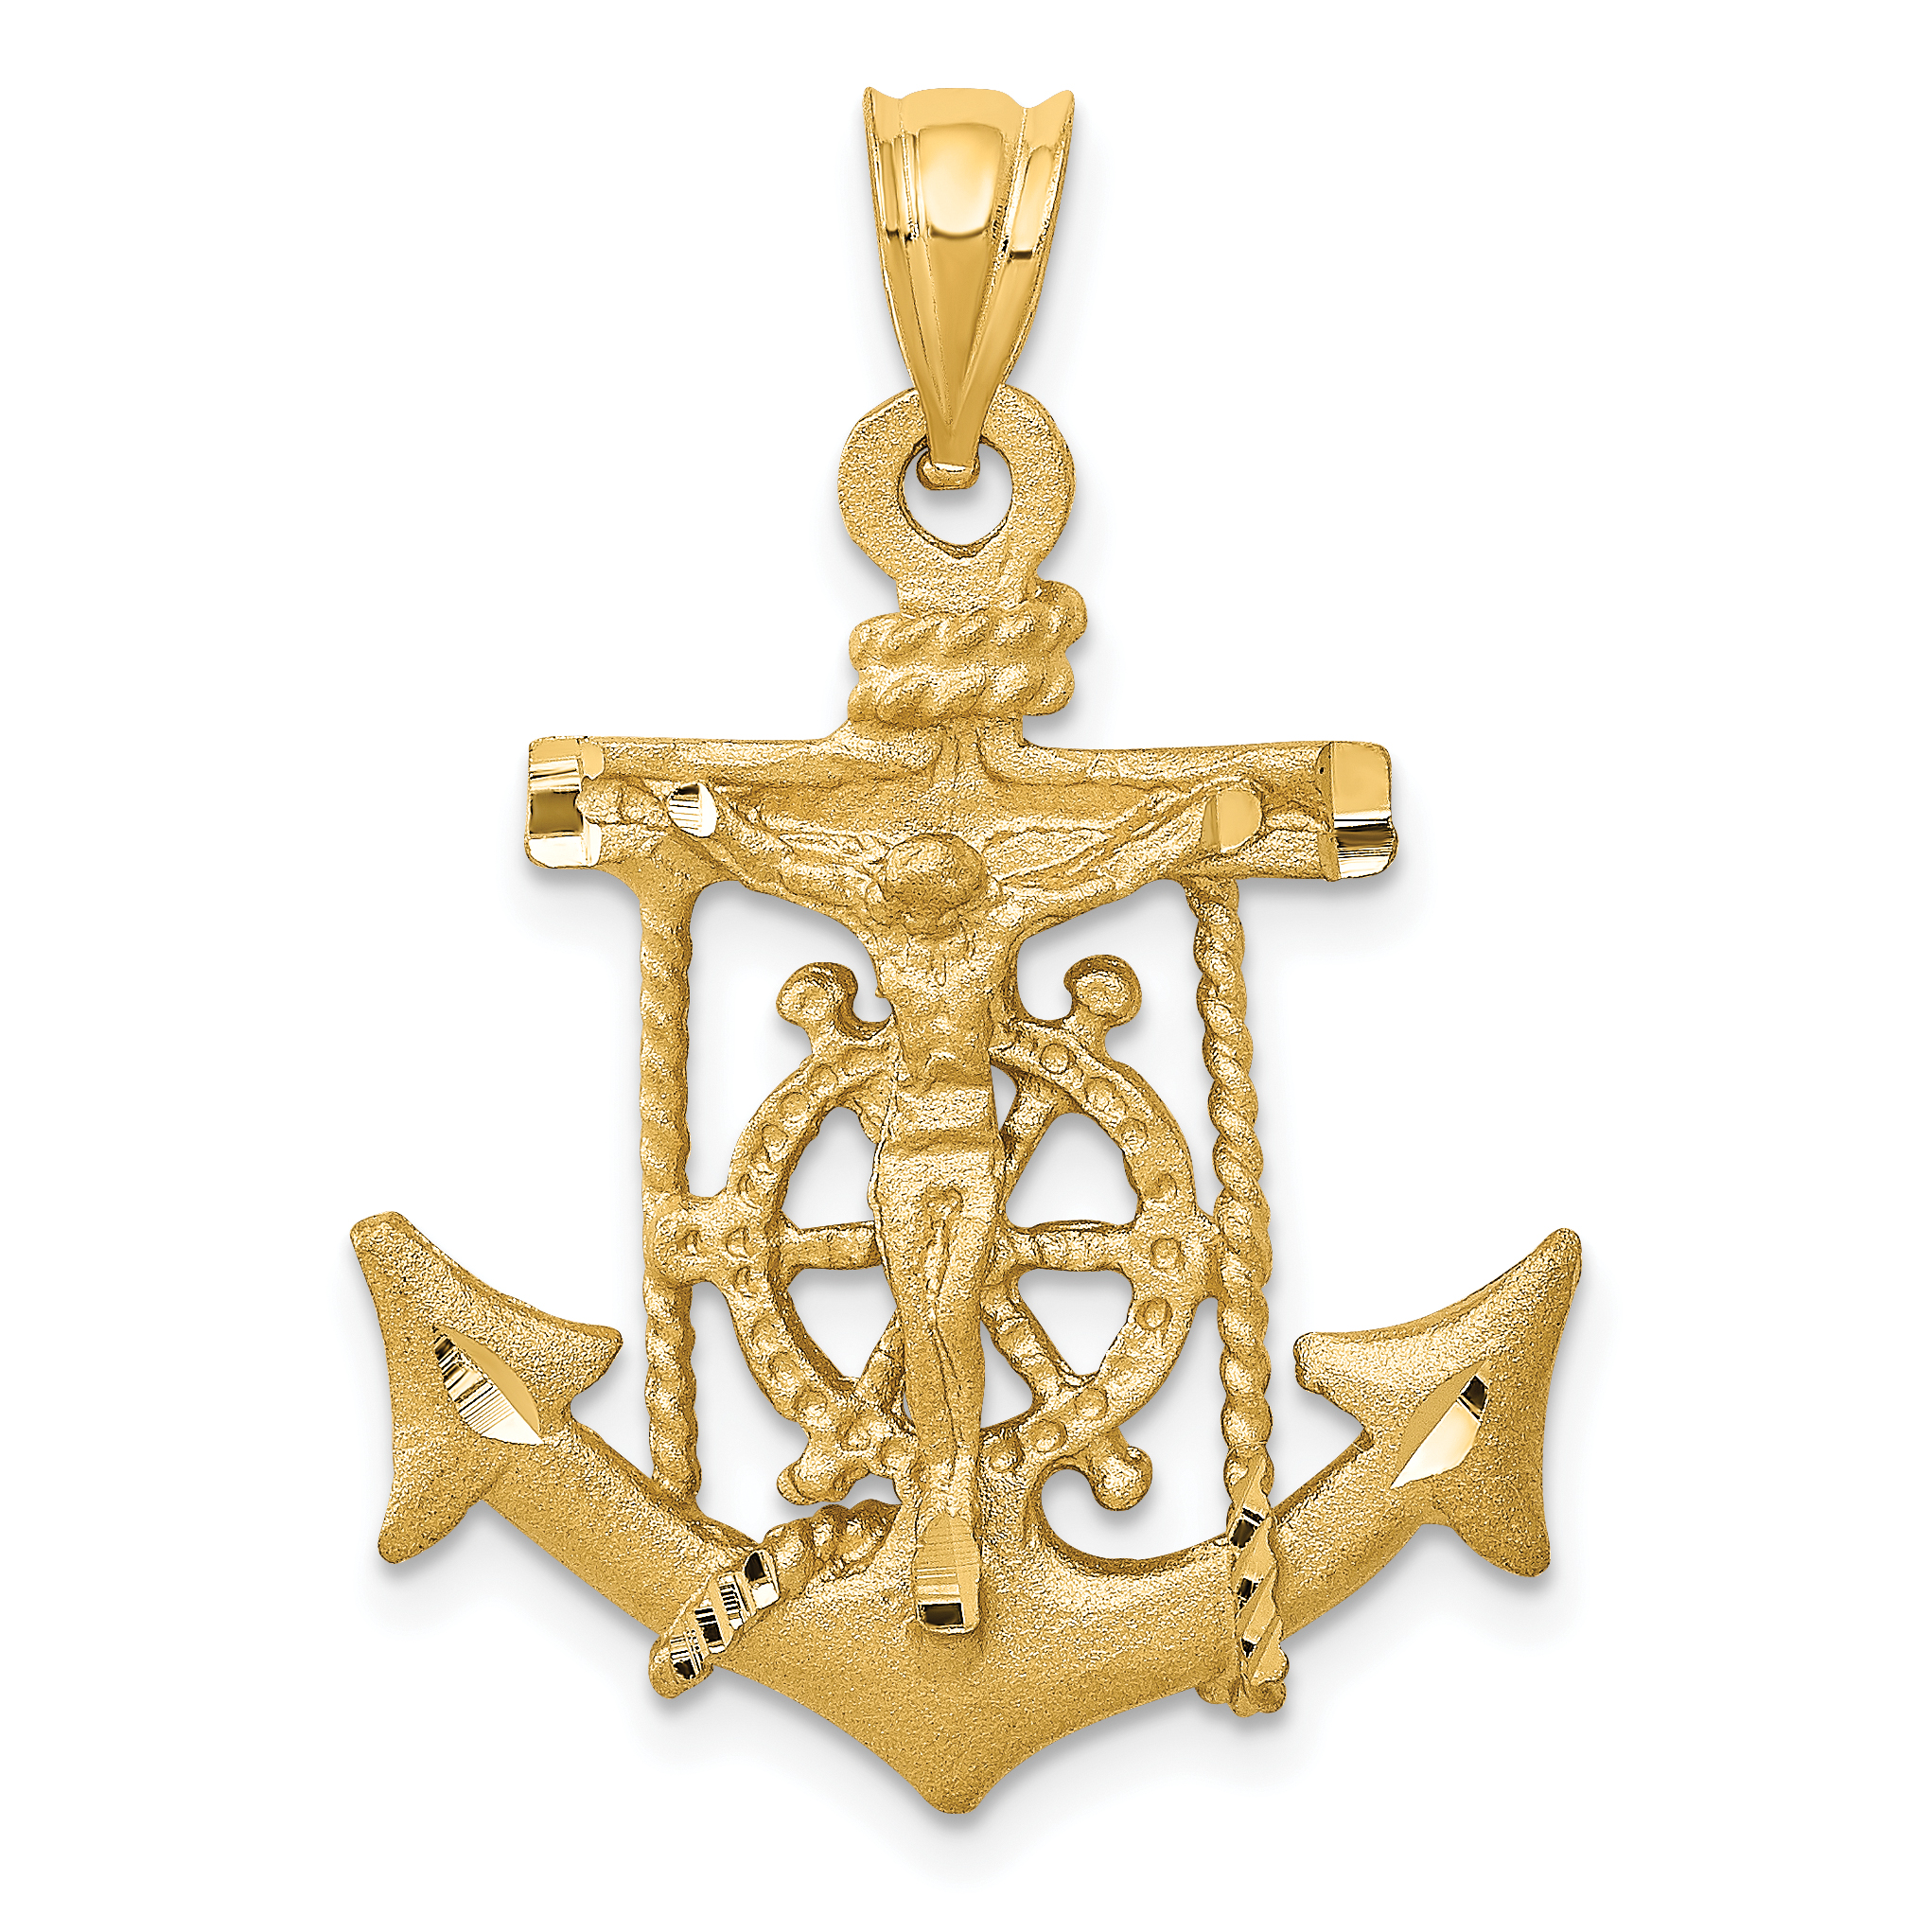 14k Mariners Cross Pendant. Weight: 2.9, Length: 28, Width: 20